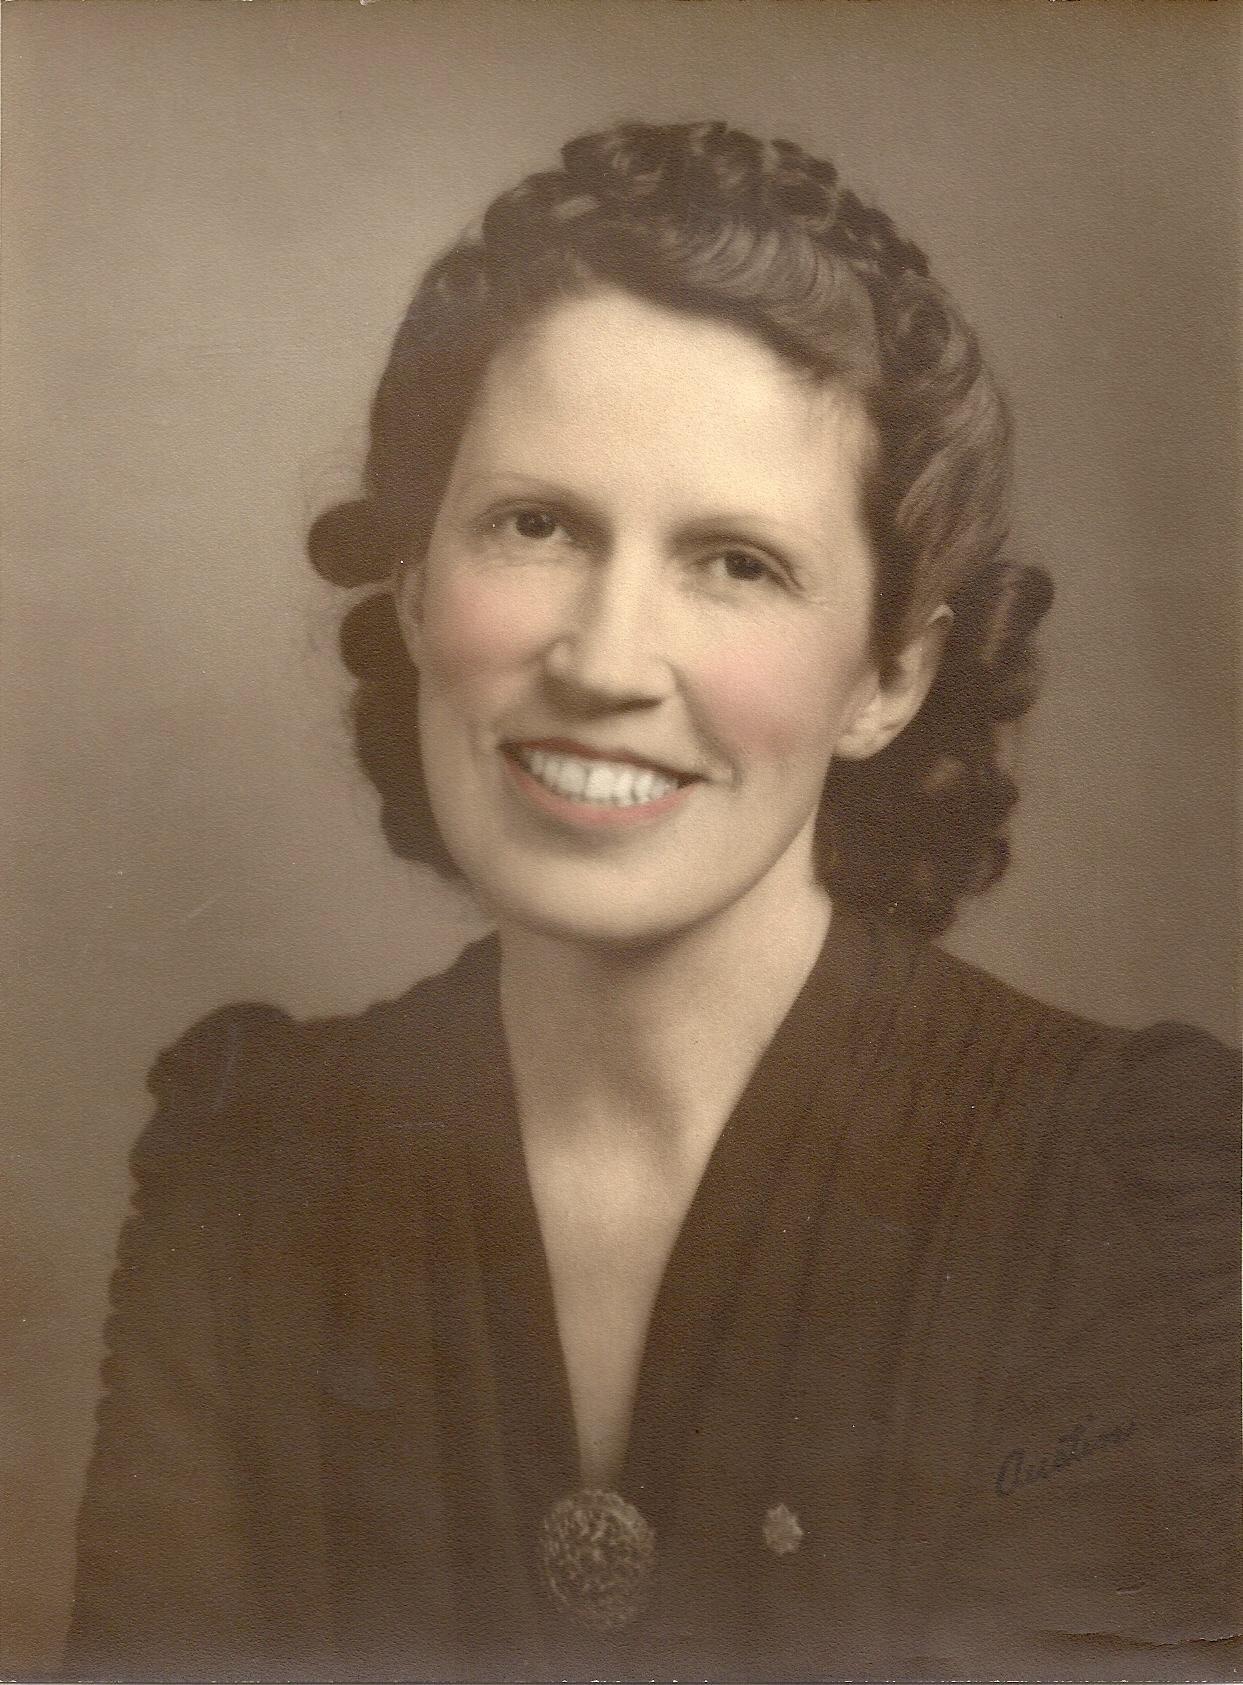 Lucille Cummins